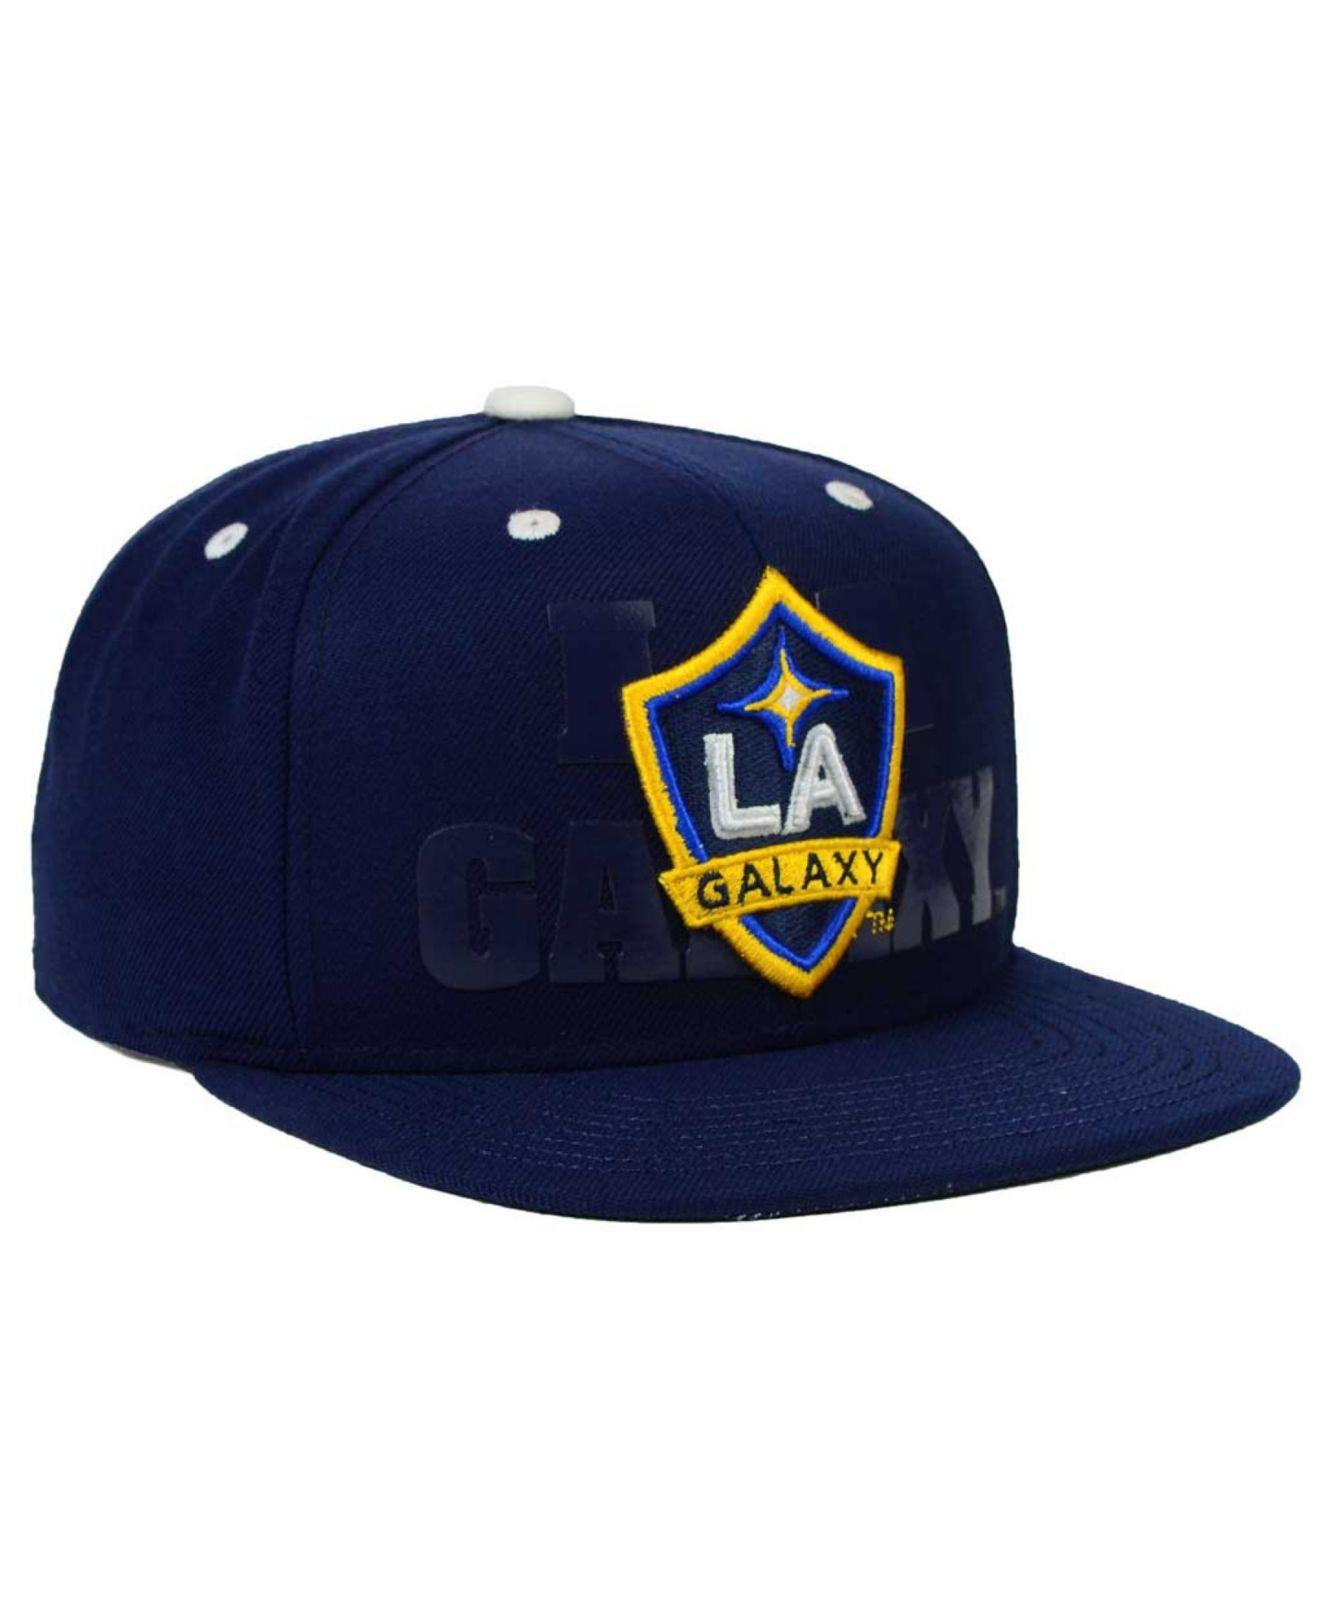 online store 93f01 371b8 adidas La Galaxy Academy Snapback Cap in Blue for Men - Lyst